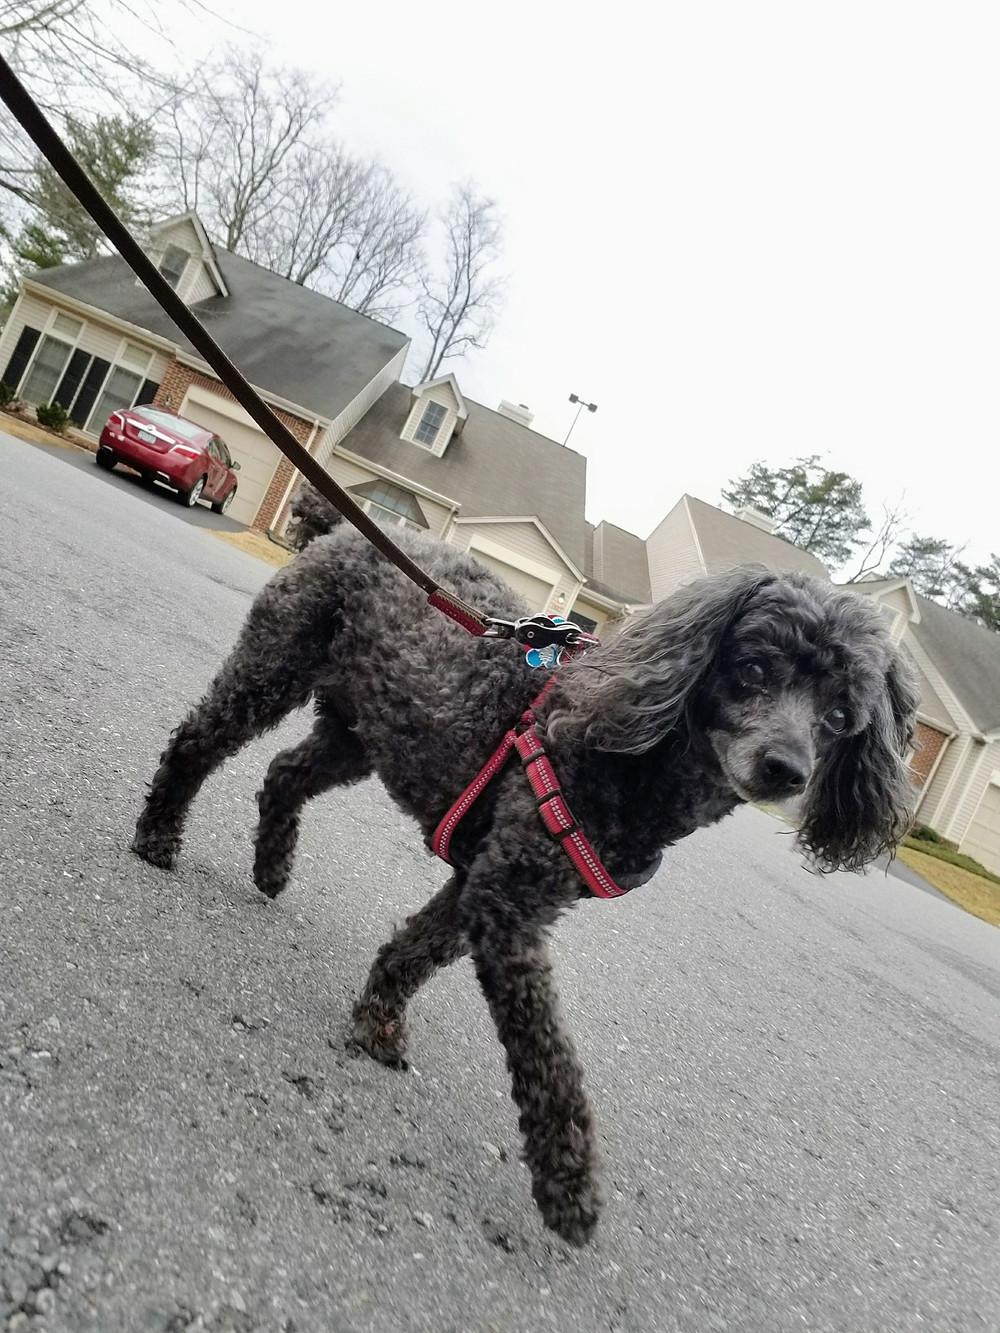 Senior dog on a walk